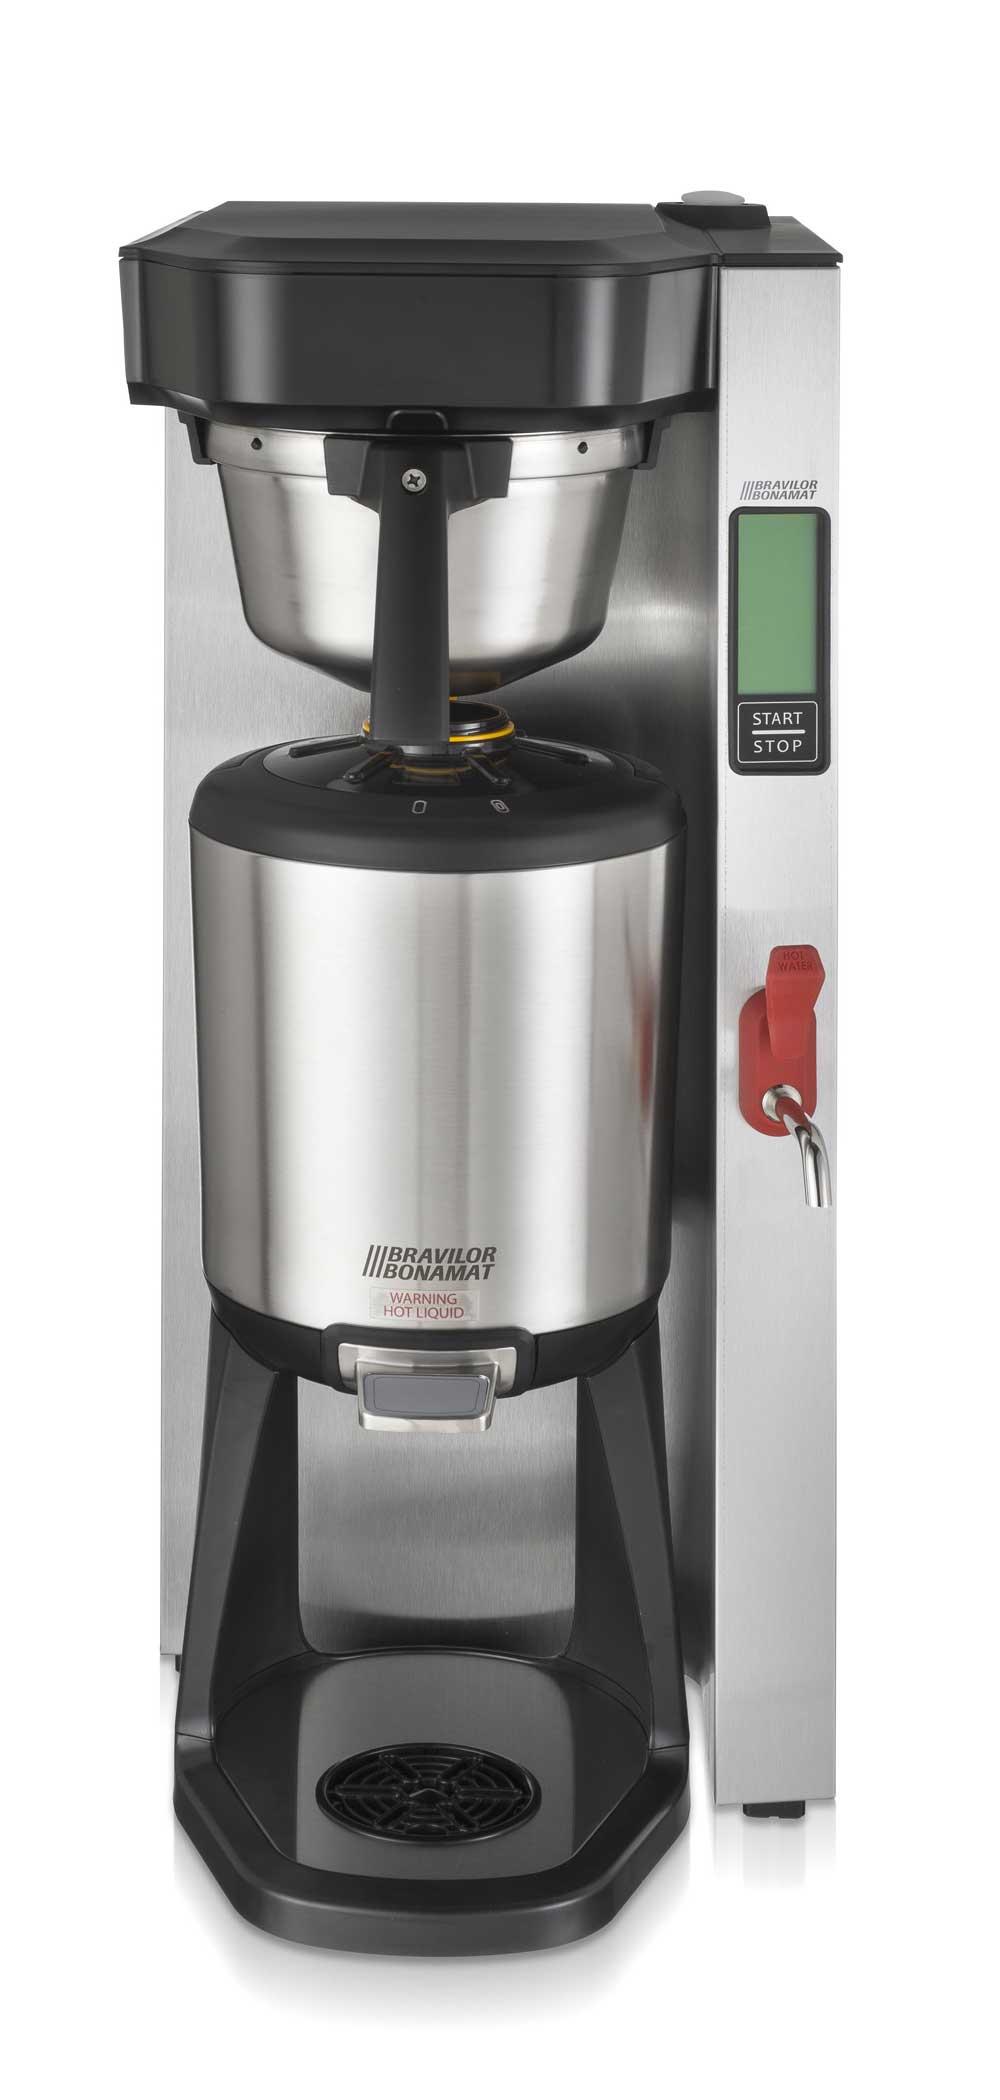 Bonamat Aurora 5.7 SGH Filterkaffeemaschine 230V od. 400V